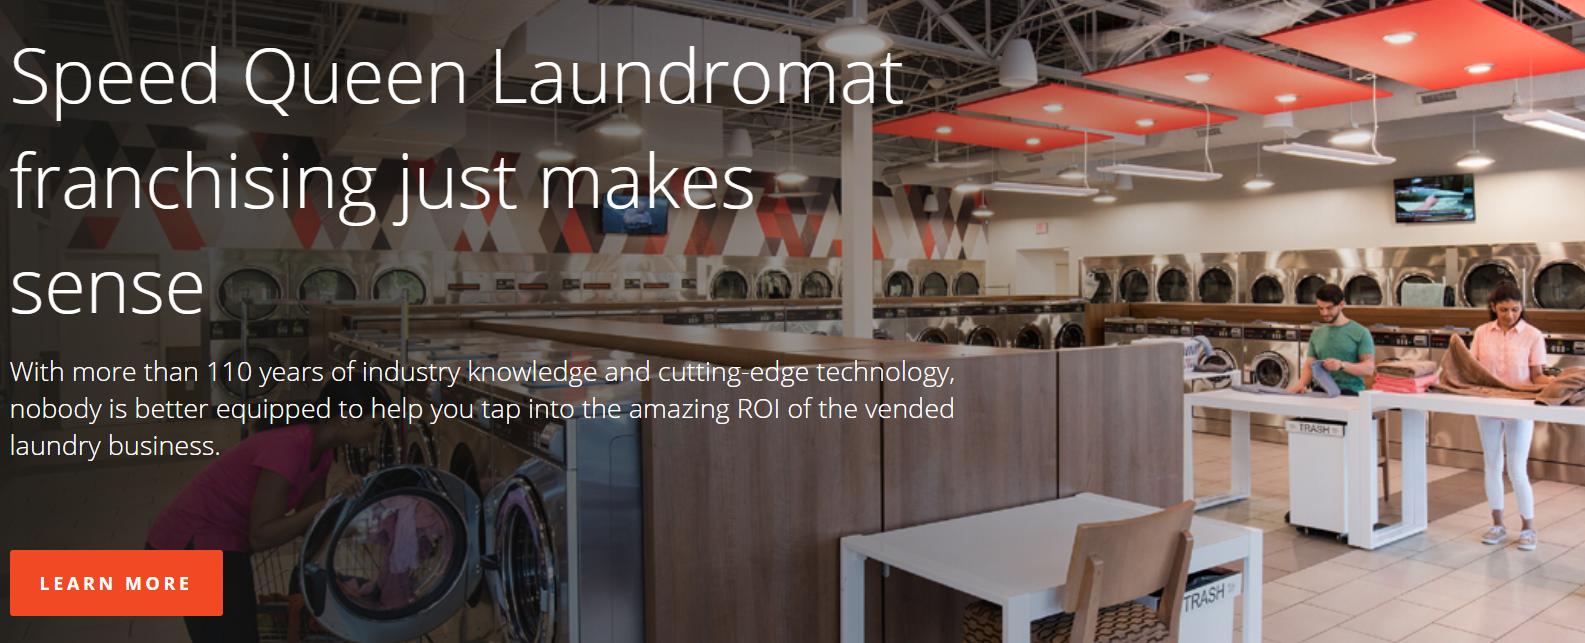 Speed Queen Laundromat